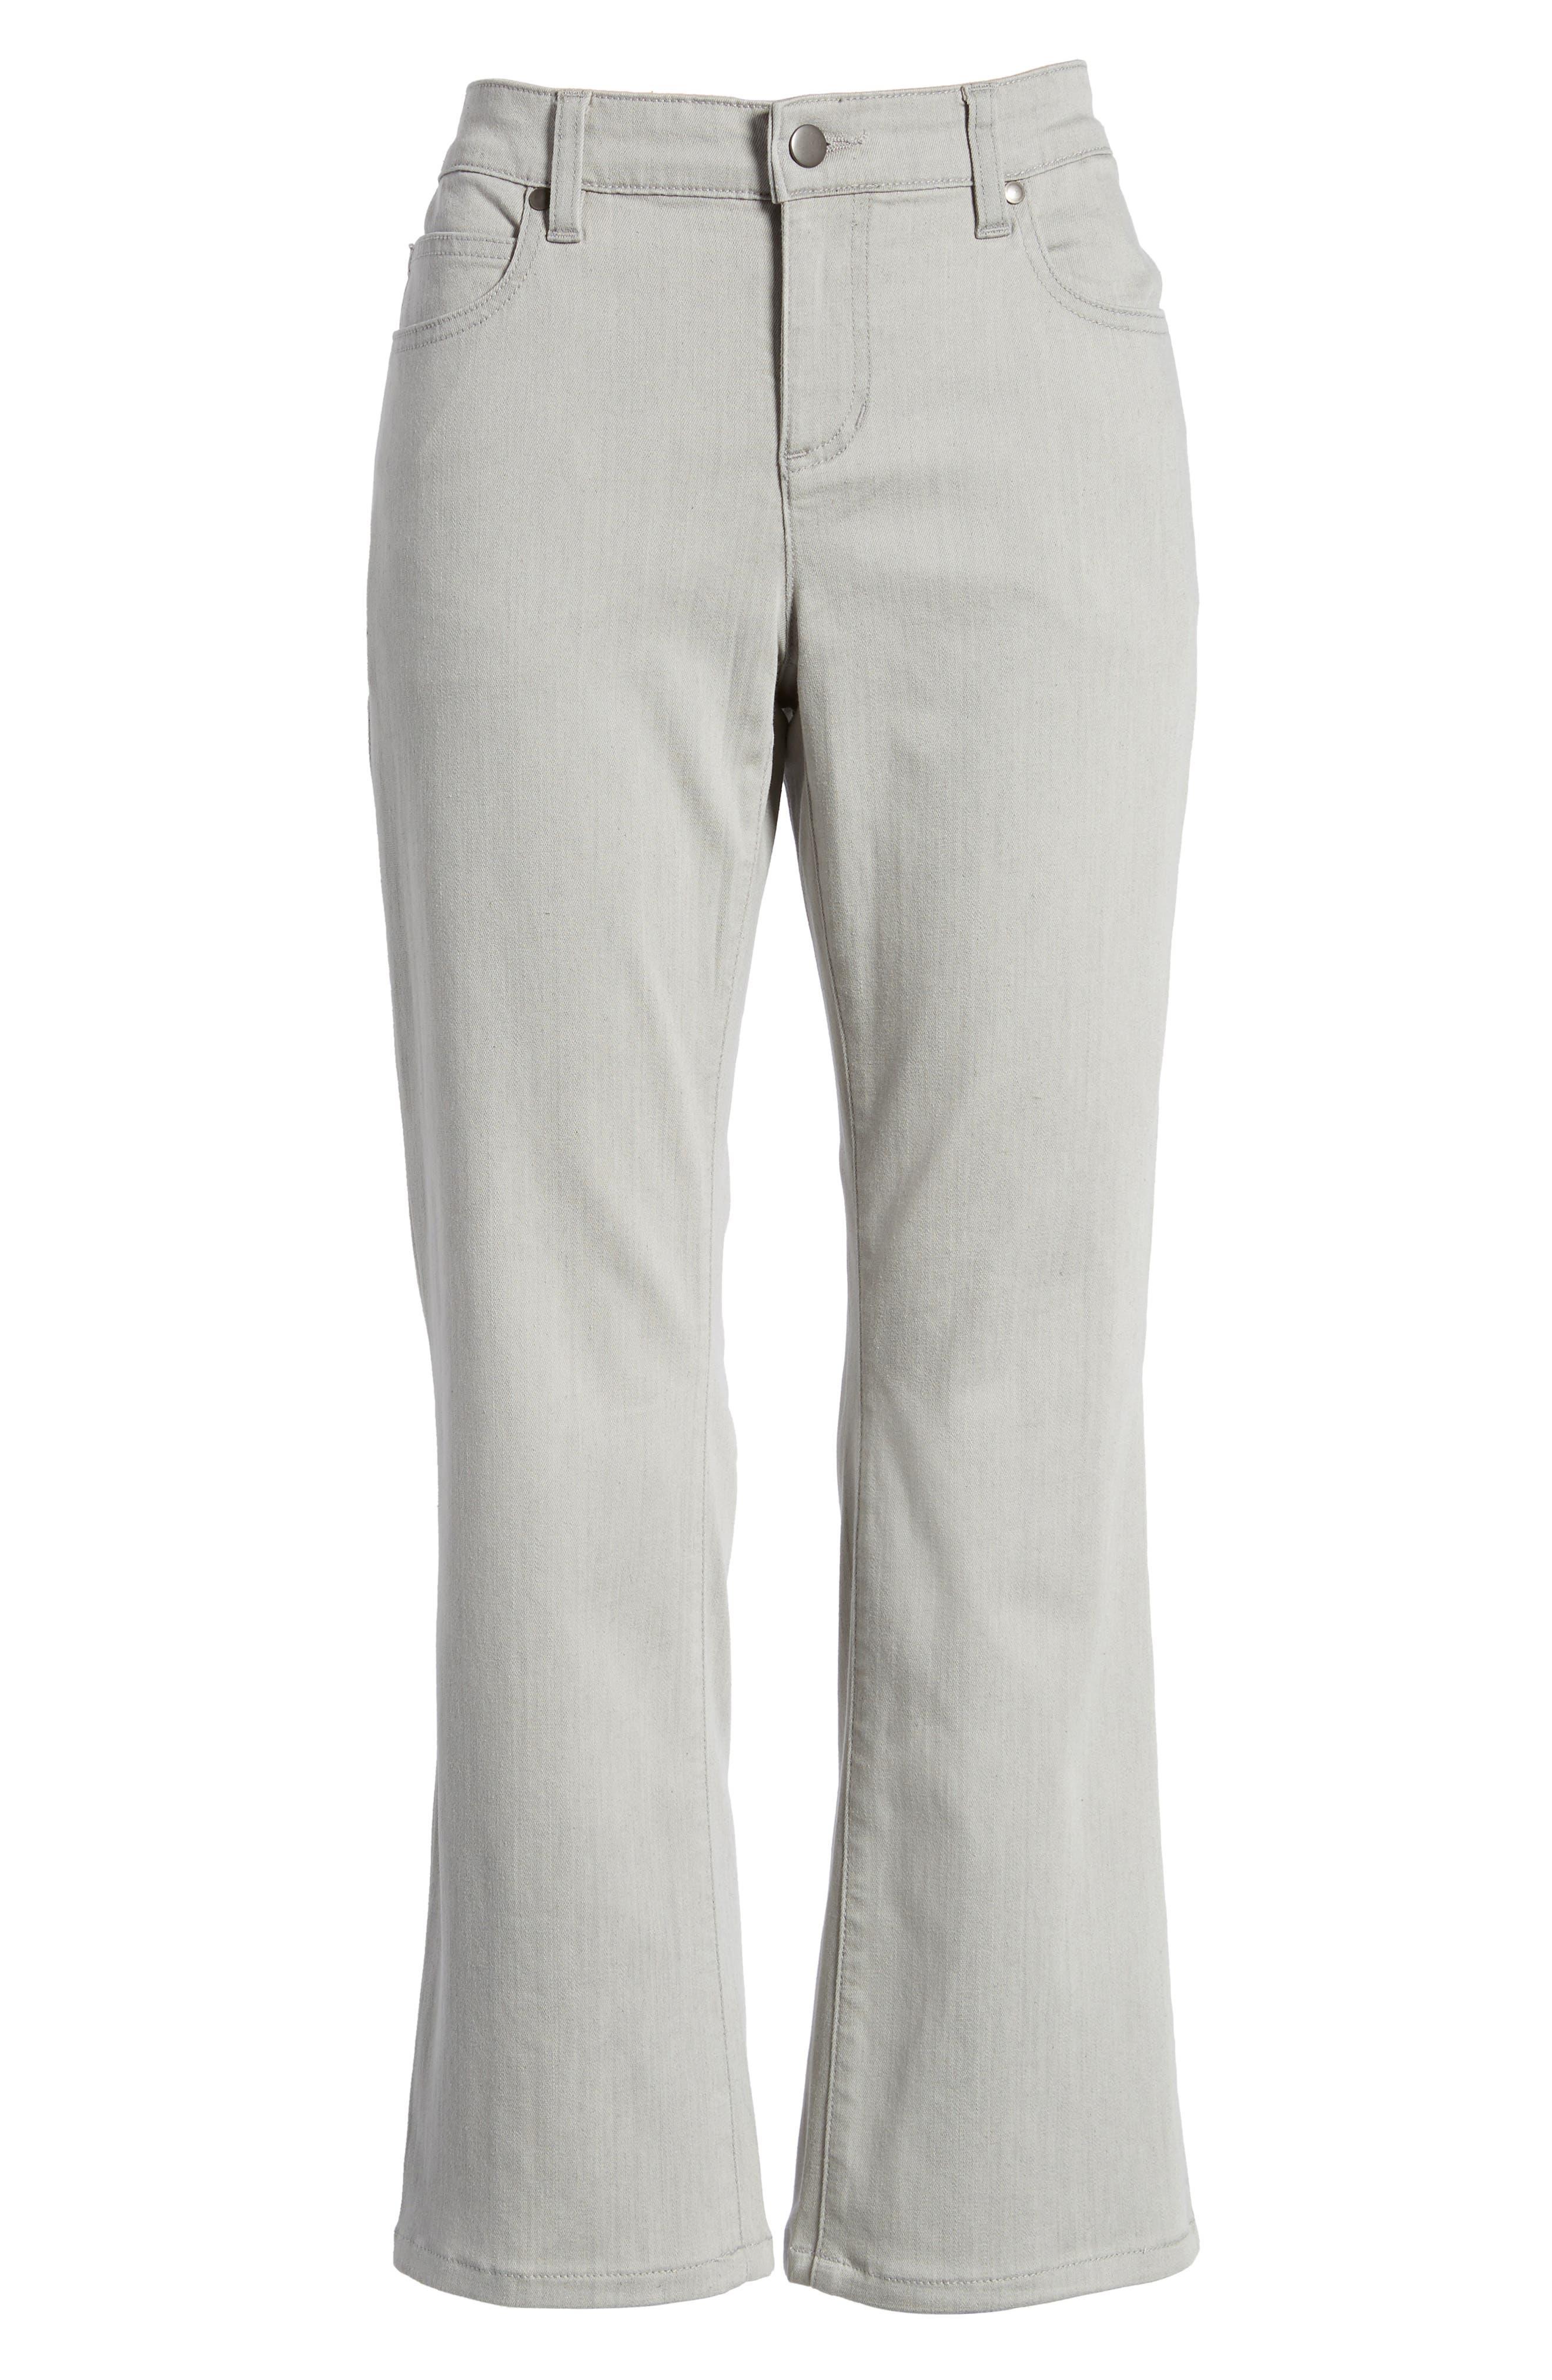 Organic Cotton Blend Crop Flare Jeans,                             Alternate thumbnail 7, color,                             Sun Bleached Gray